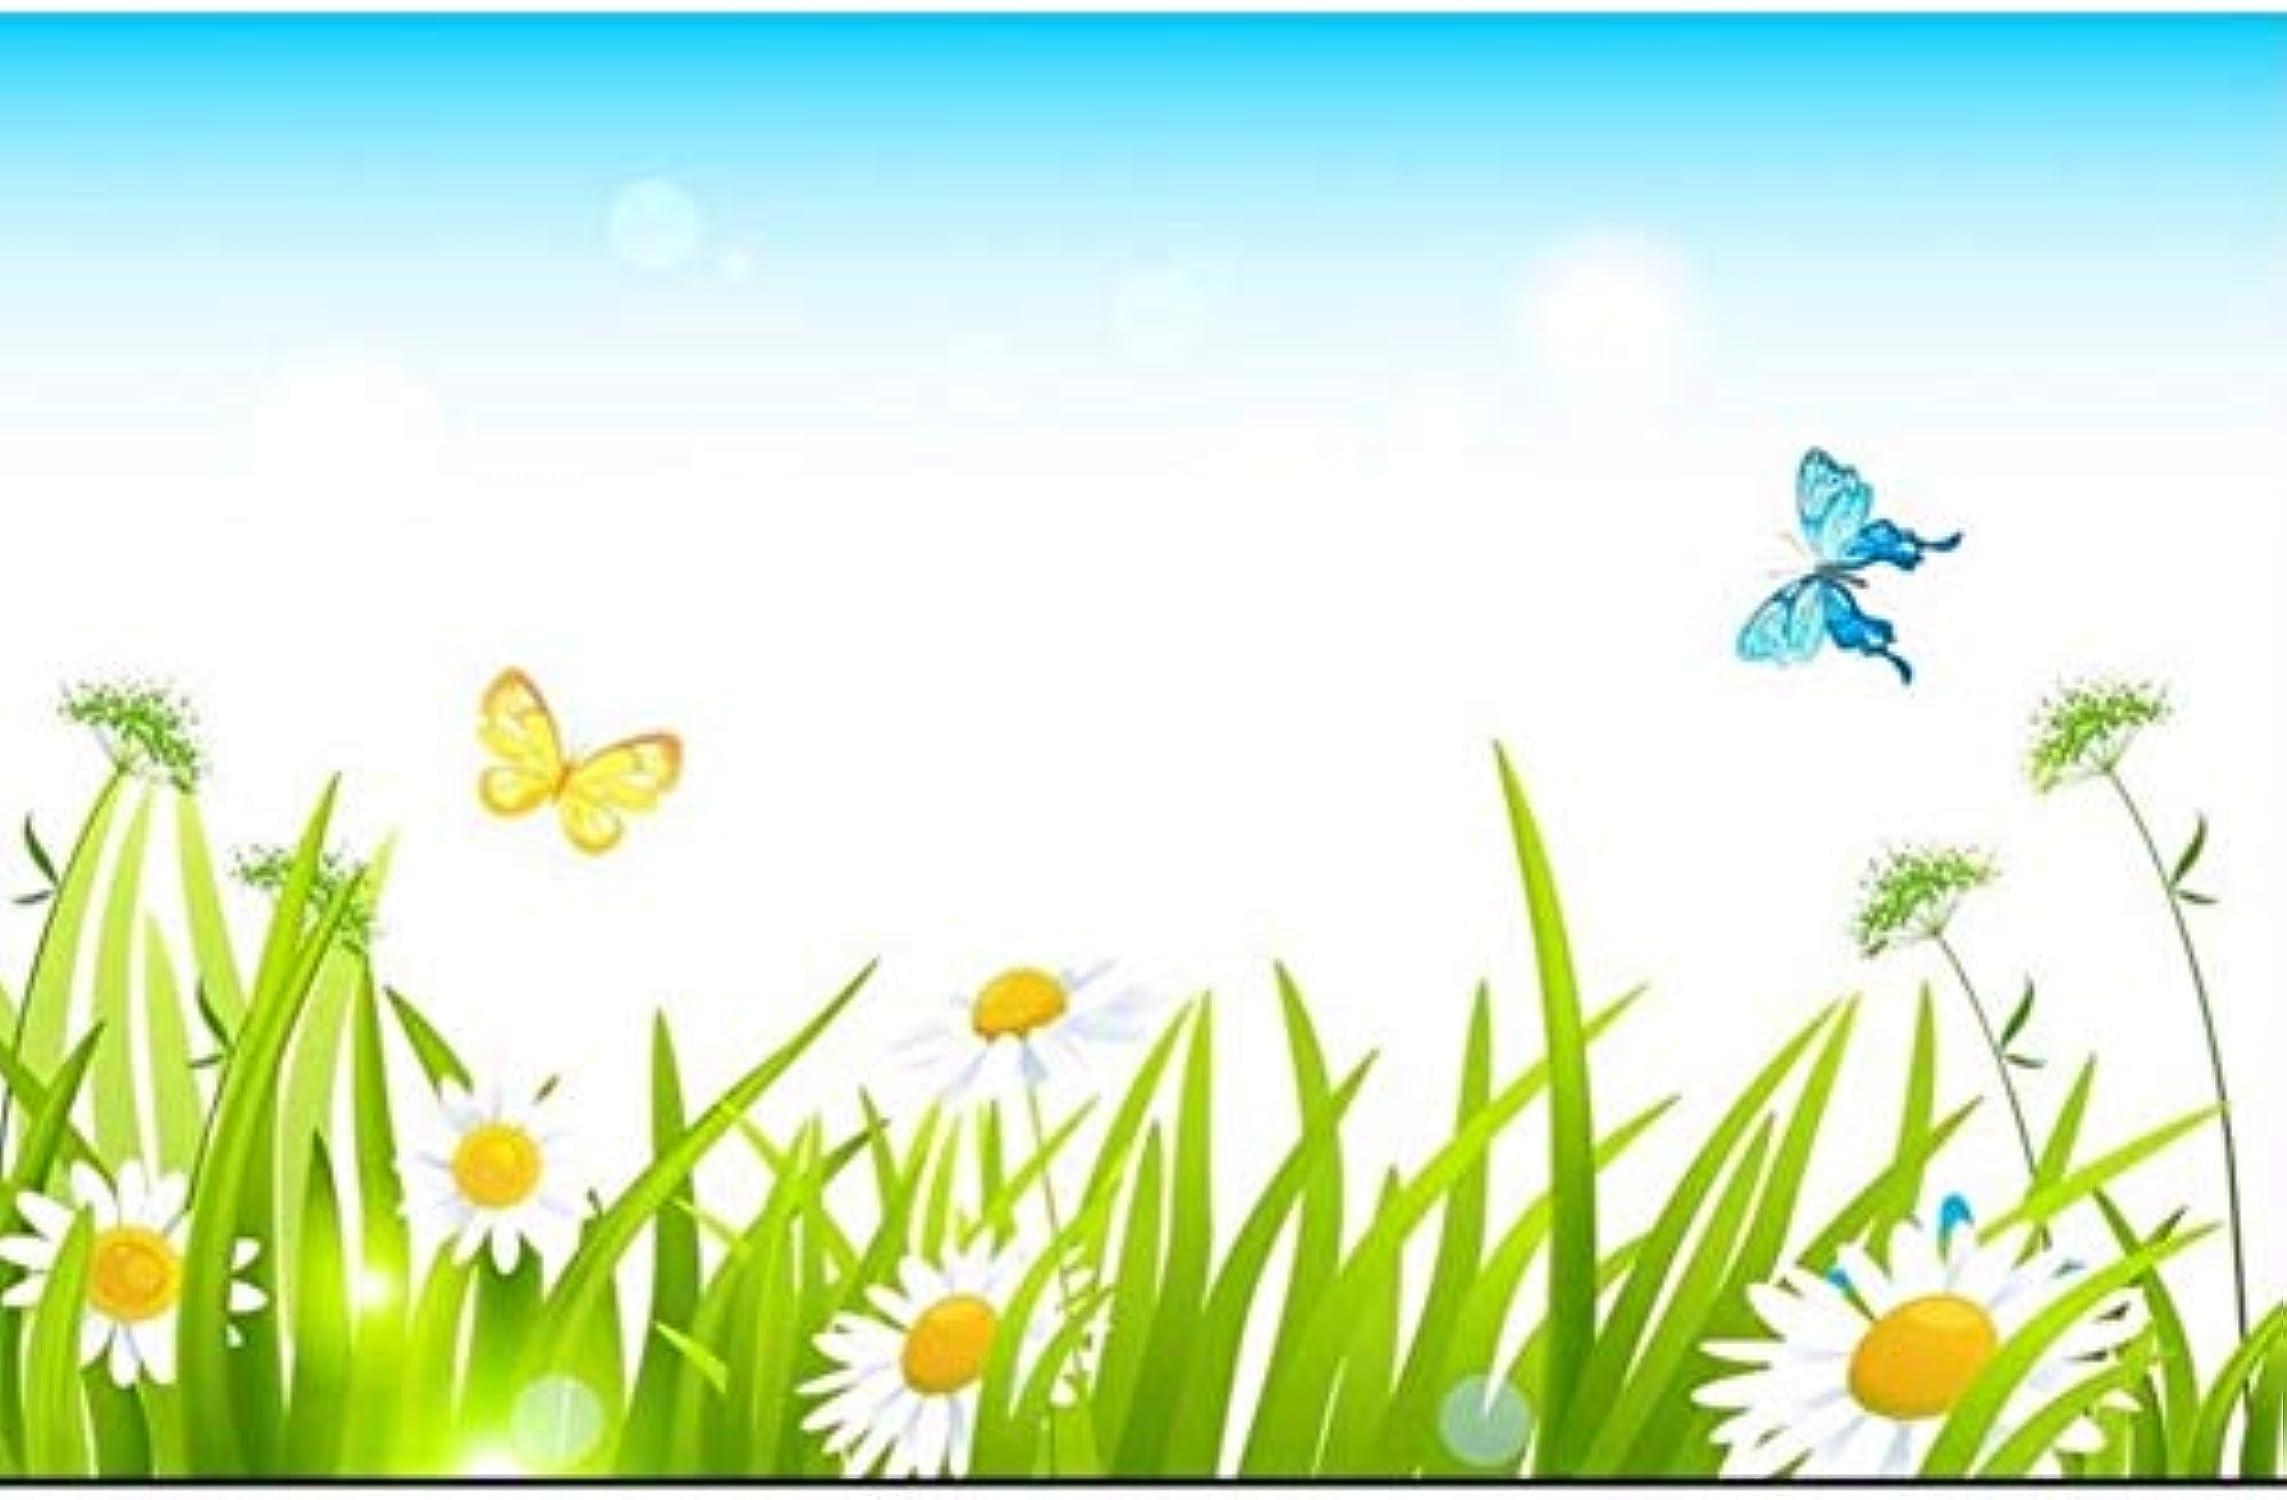 ¡no ser extrañado! Qwerlp Qwerlp Qwerlp Papel Tapiz 3D Personalizado Para Niños Habitación Mural No Tejido Etiqueta De La Parojo Mariposa Hierba Pintura Foto Murales De Parojo 3D Papel Tapiz Para Parojoes 3D-200X140CM  envío gratis